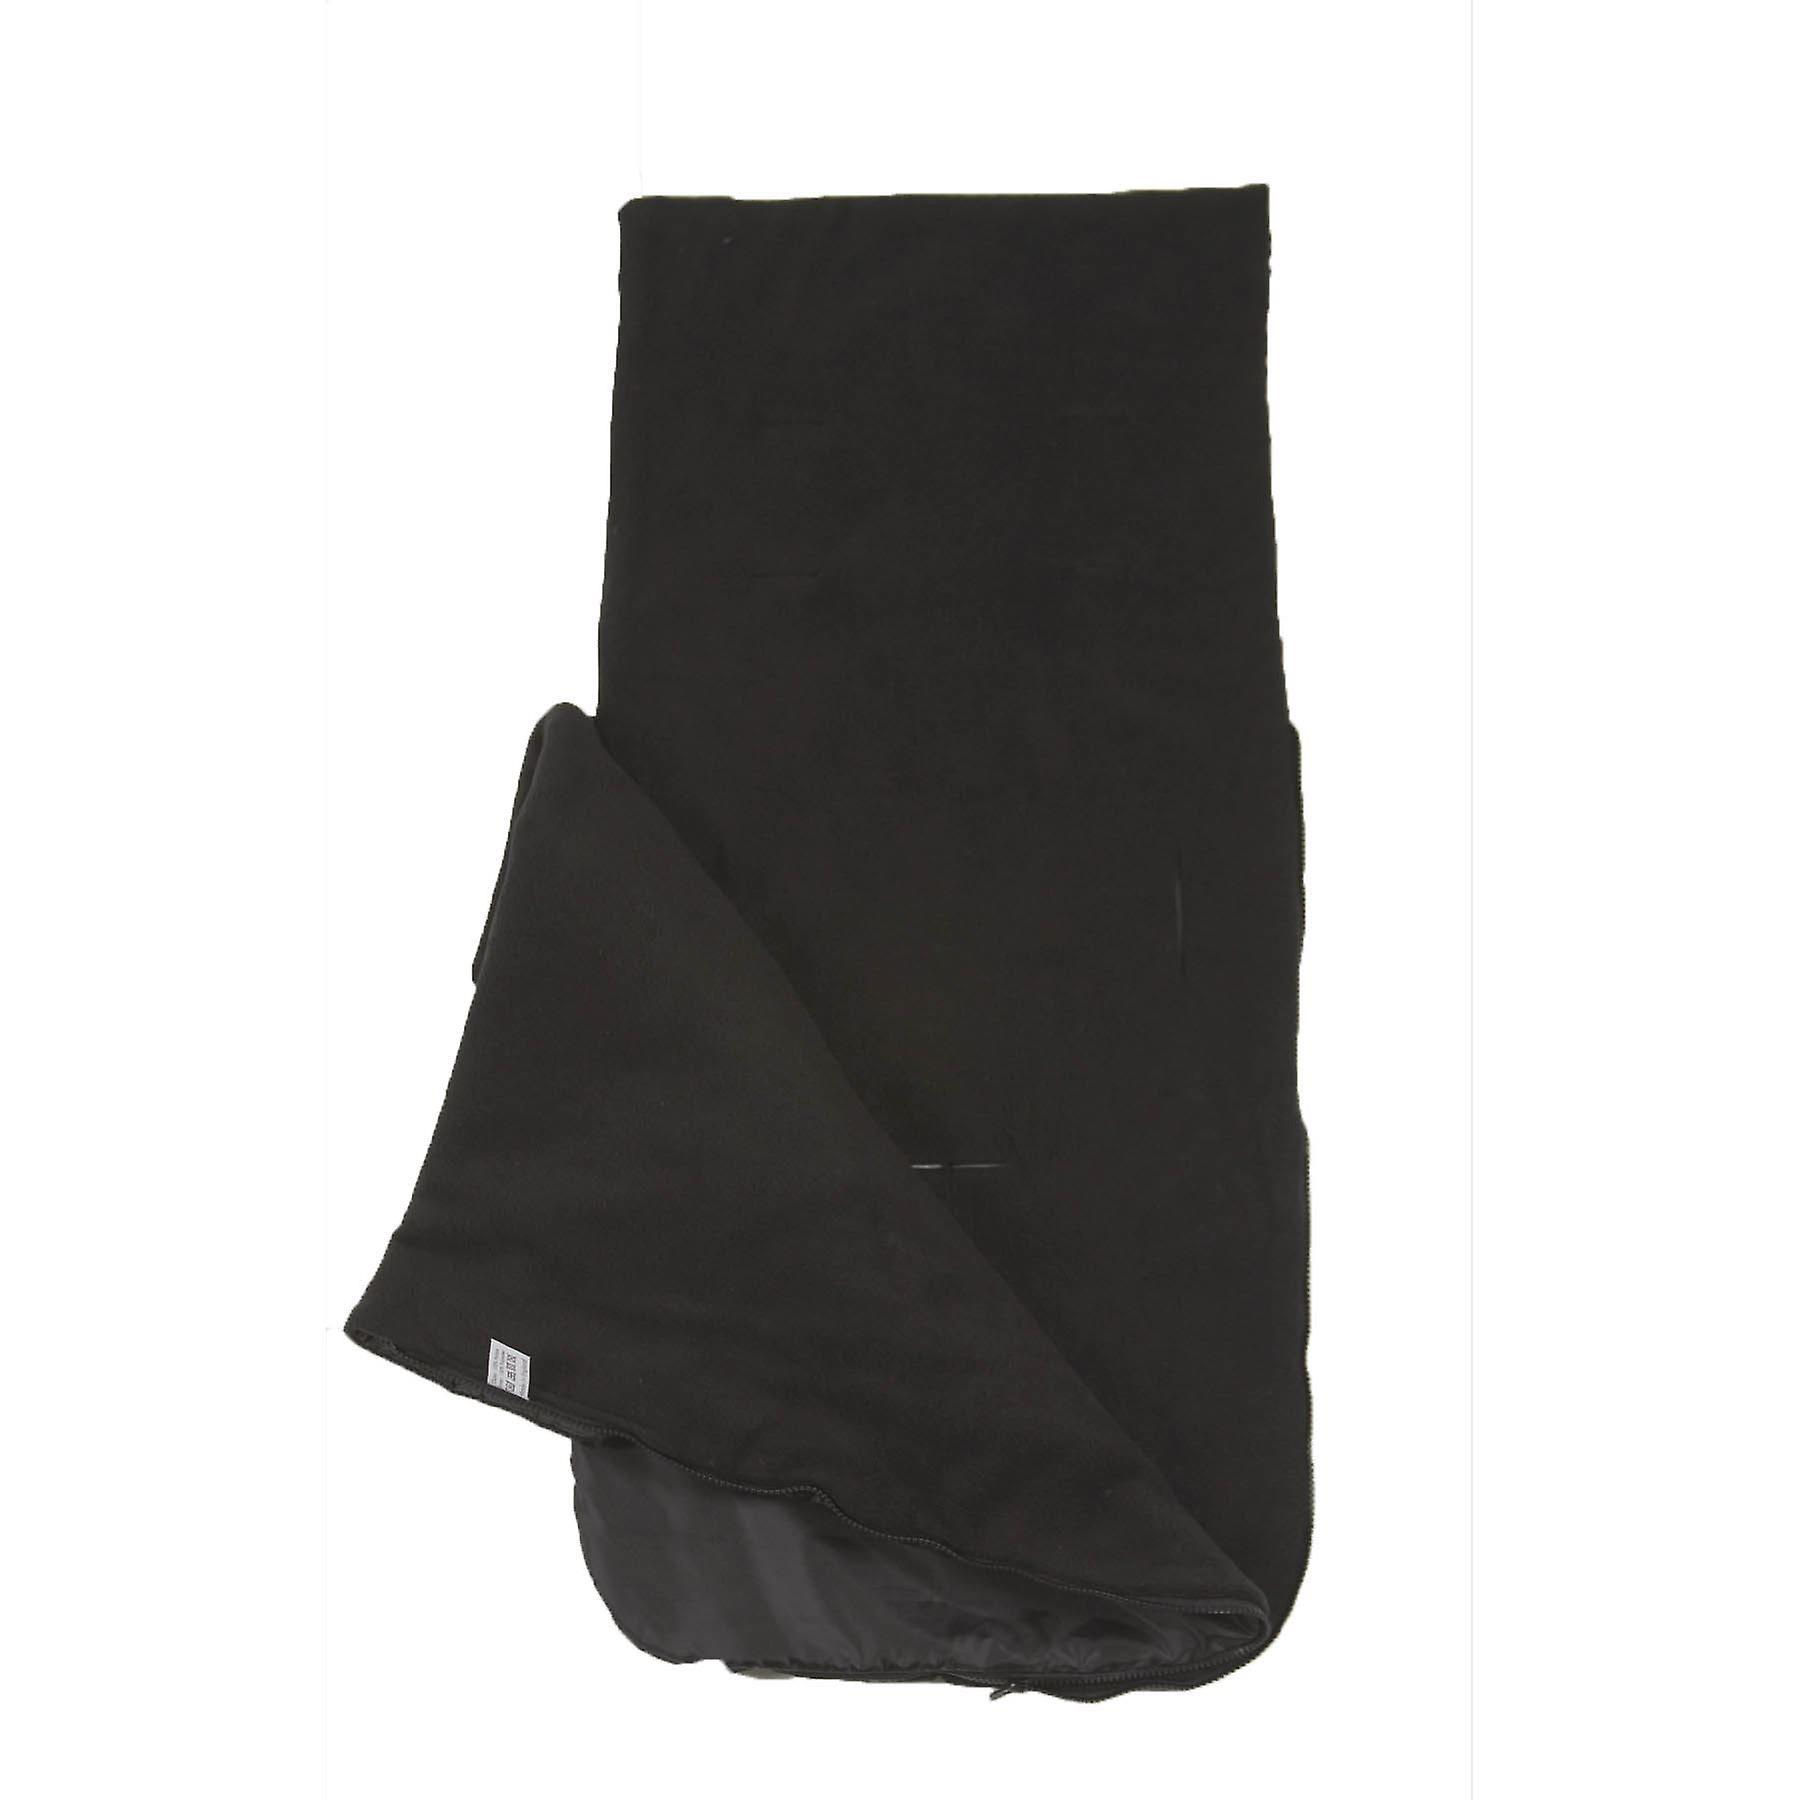 Genesis Universal Plain Soft Fleece Footmuff Cosytoes Buggy Liner